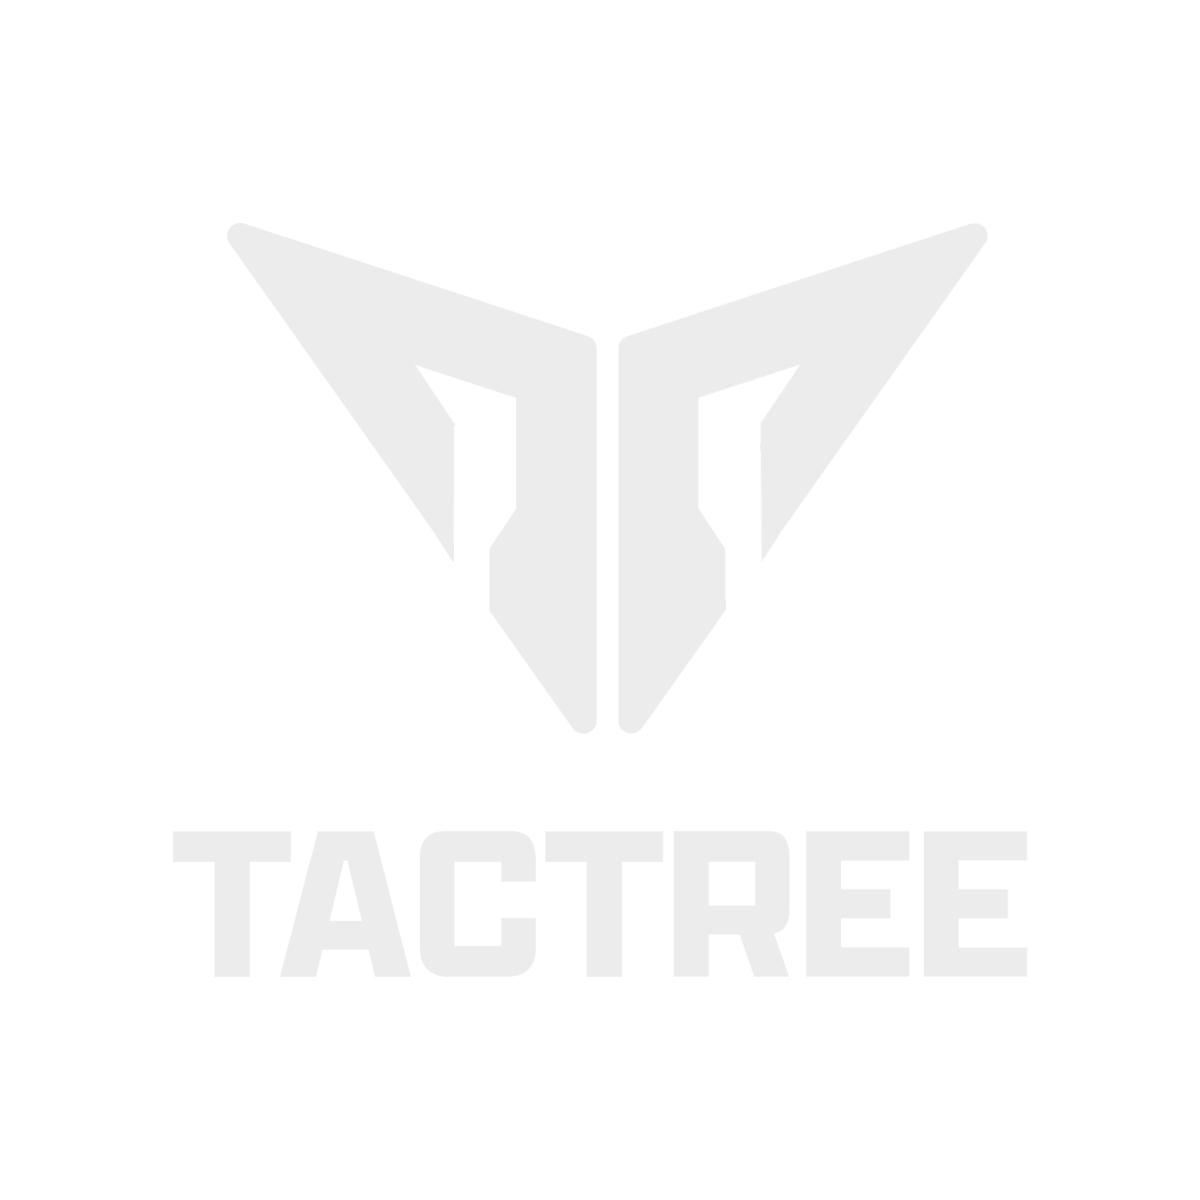 SOFTT-Special Operations Forces Tactical Tourniquet (Orange)